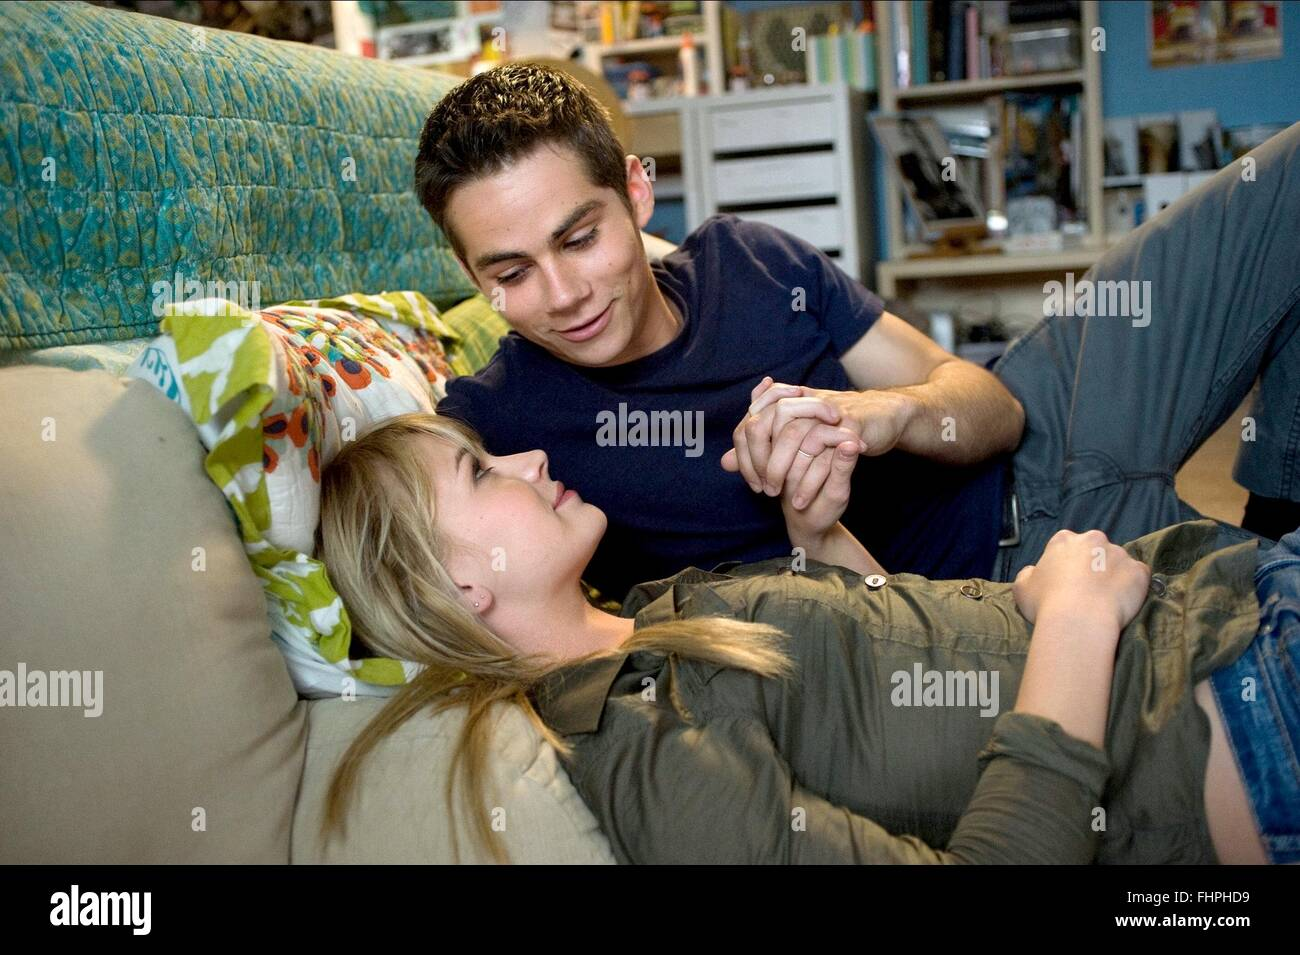 Dylan o Brien Britt Robertson dating 2014 psychopaten dating andere psychopaten